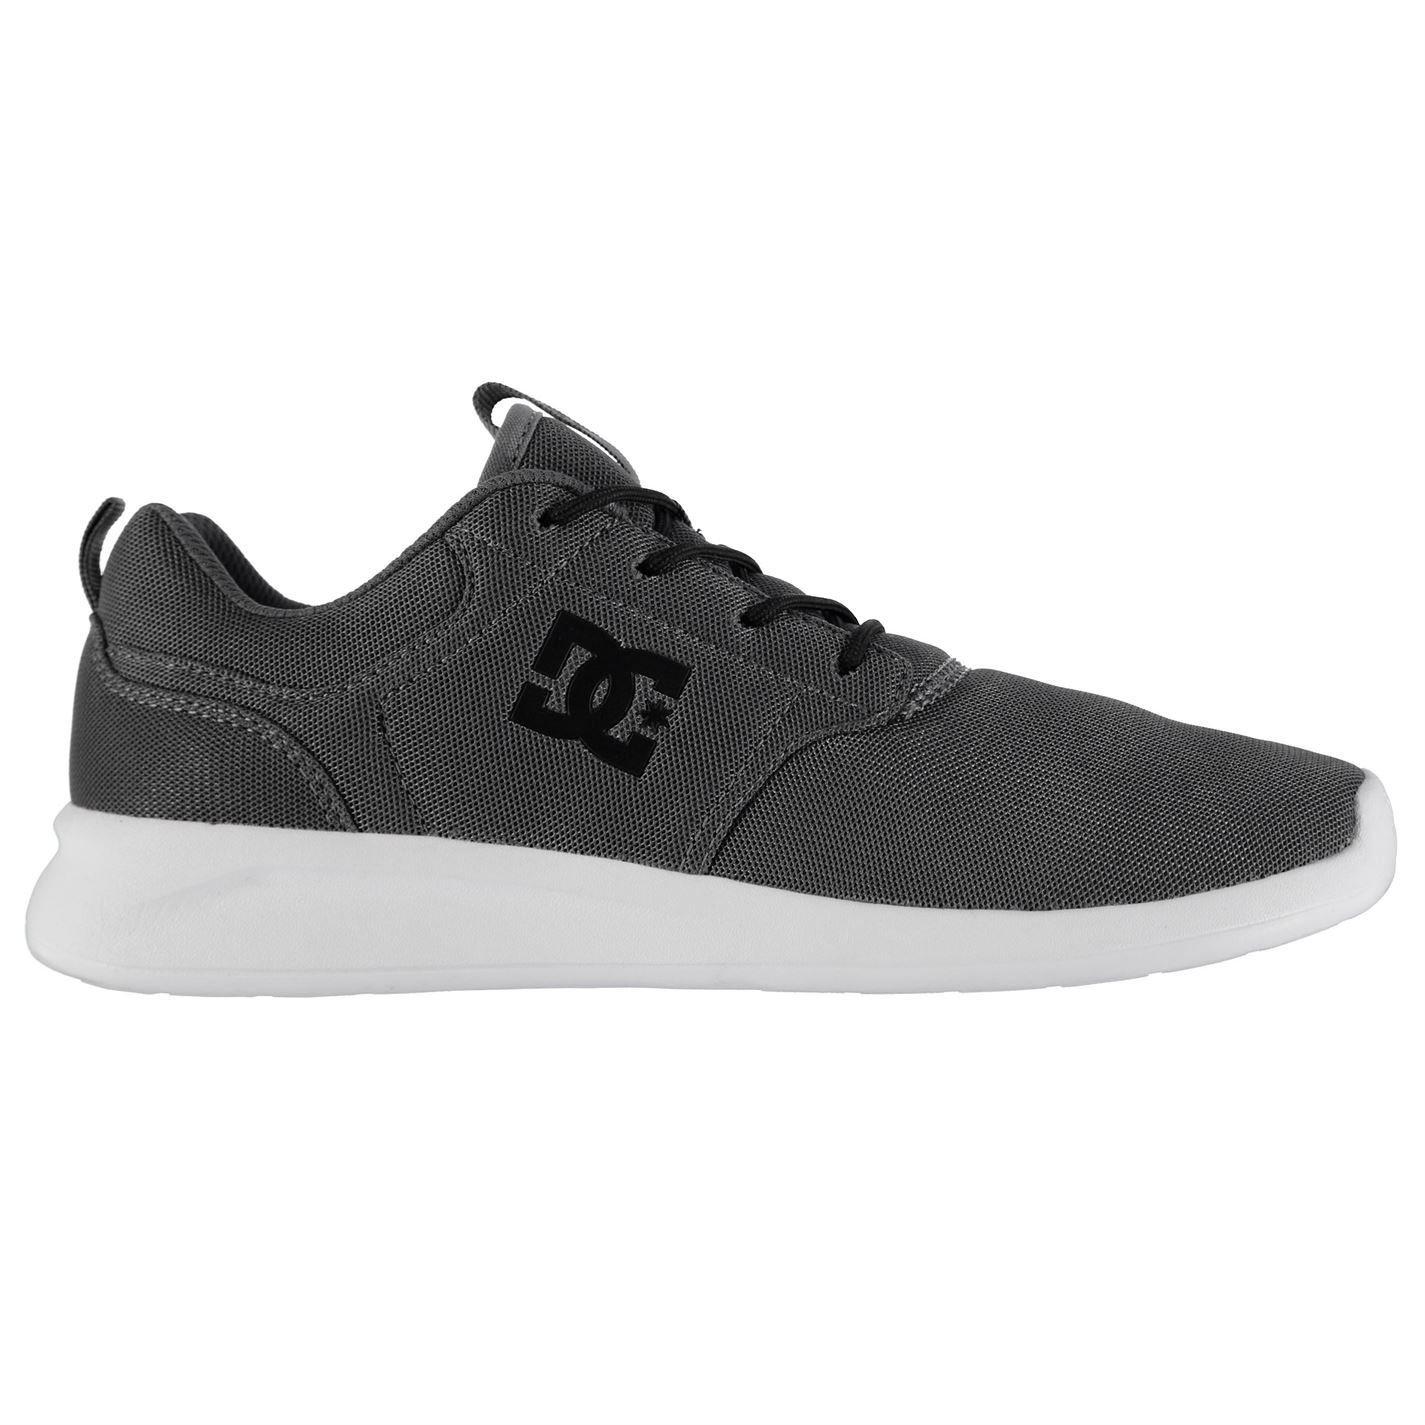 Original DC-Skateboarding grau Midway Skate-Schuhe Herren Turnschuhe Turnschuhe Schuhe